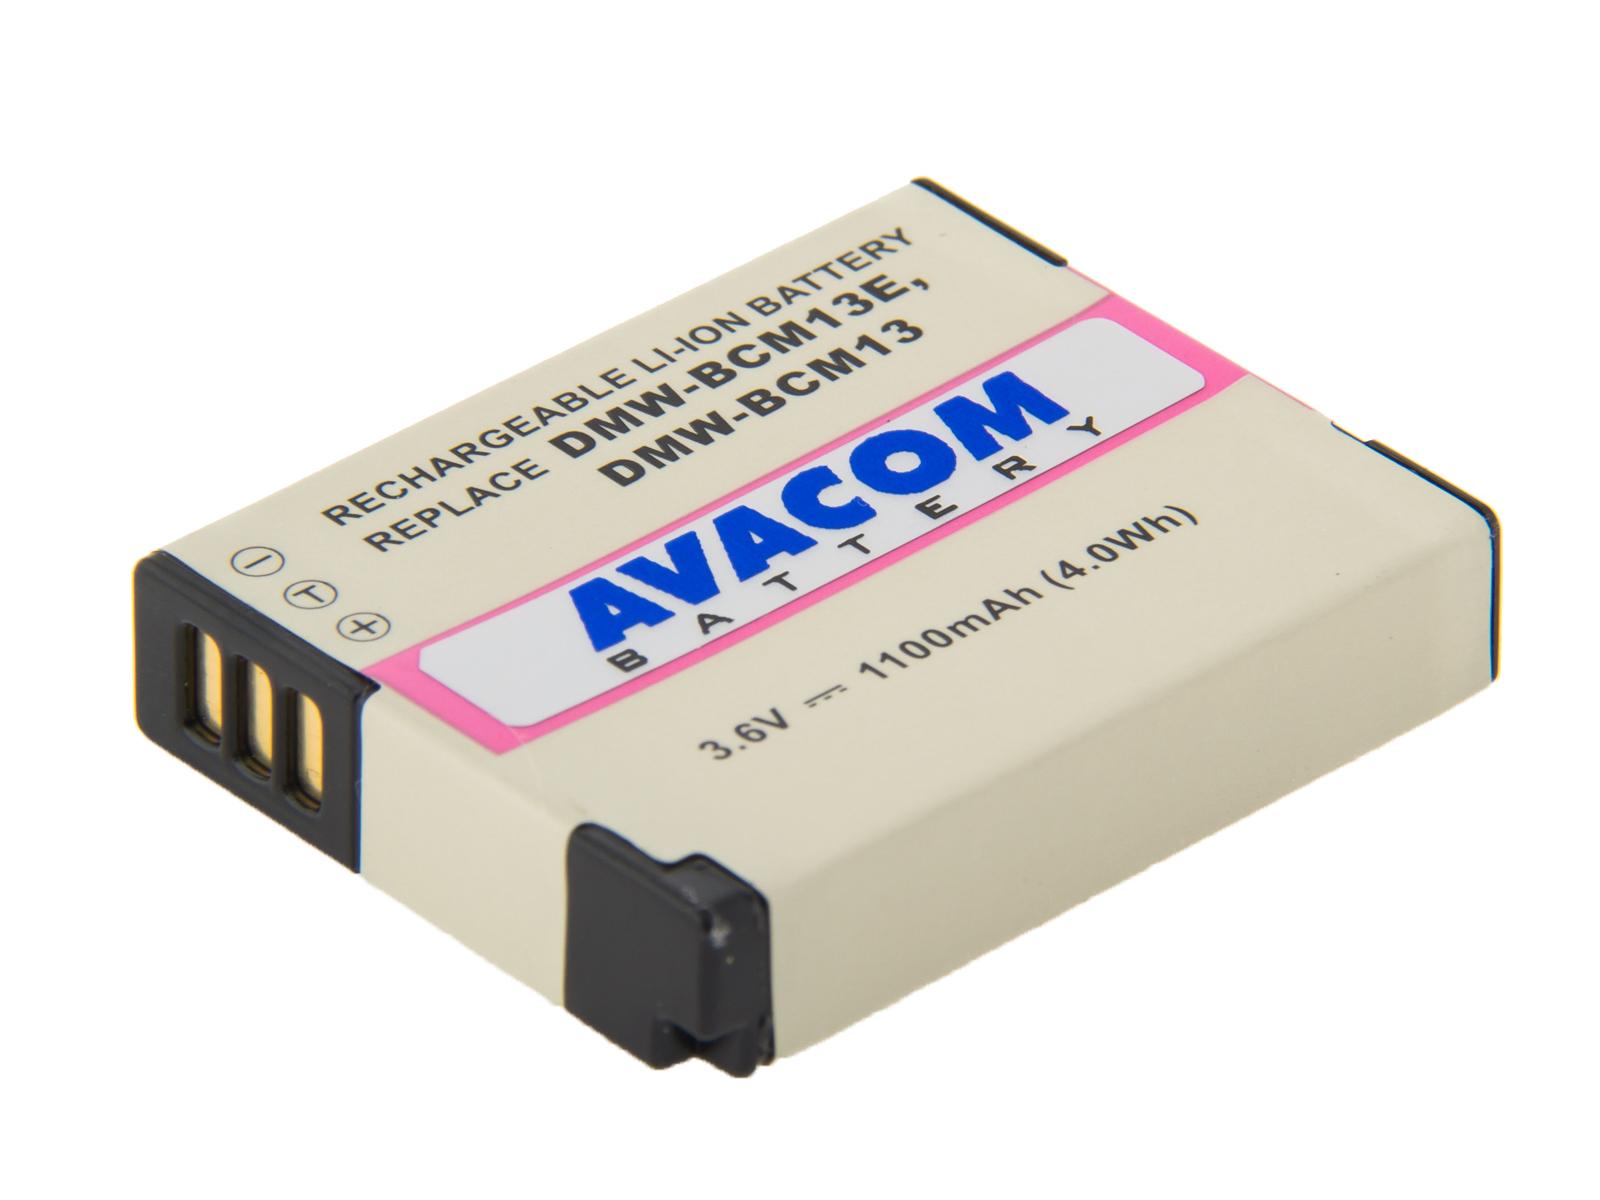 Baterie AVACOM Panasonic DMW-BCM13, BCM13E Li-Ion 3.6V 1100mAh 4Wh